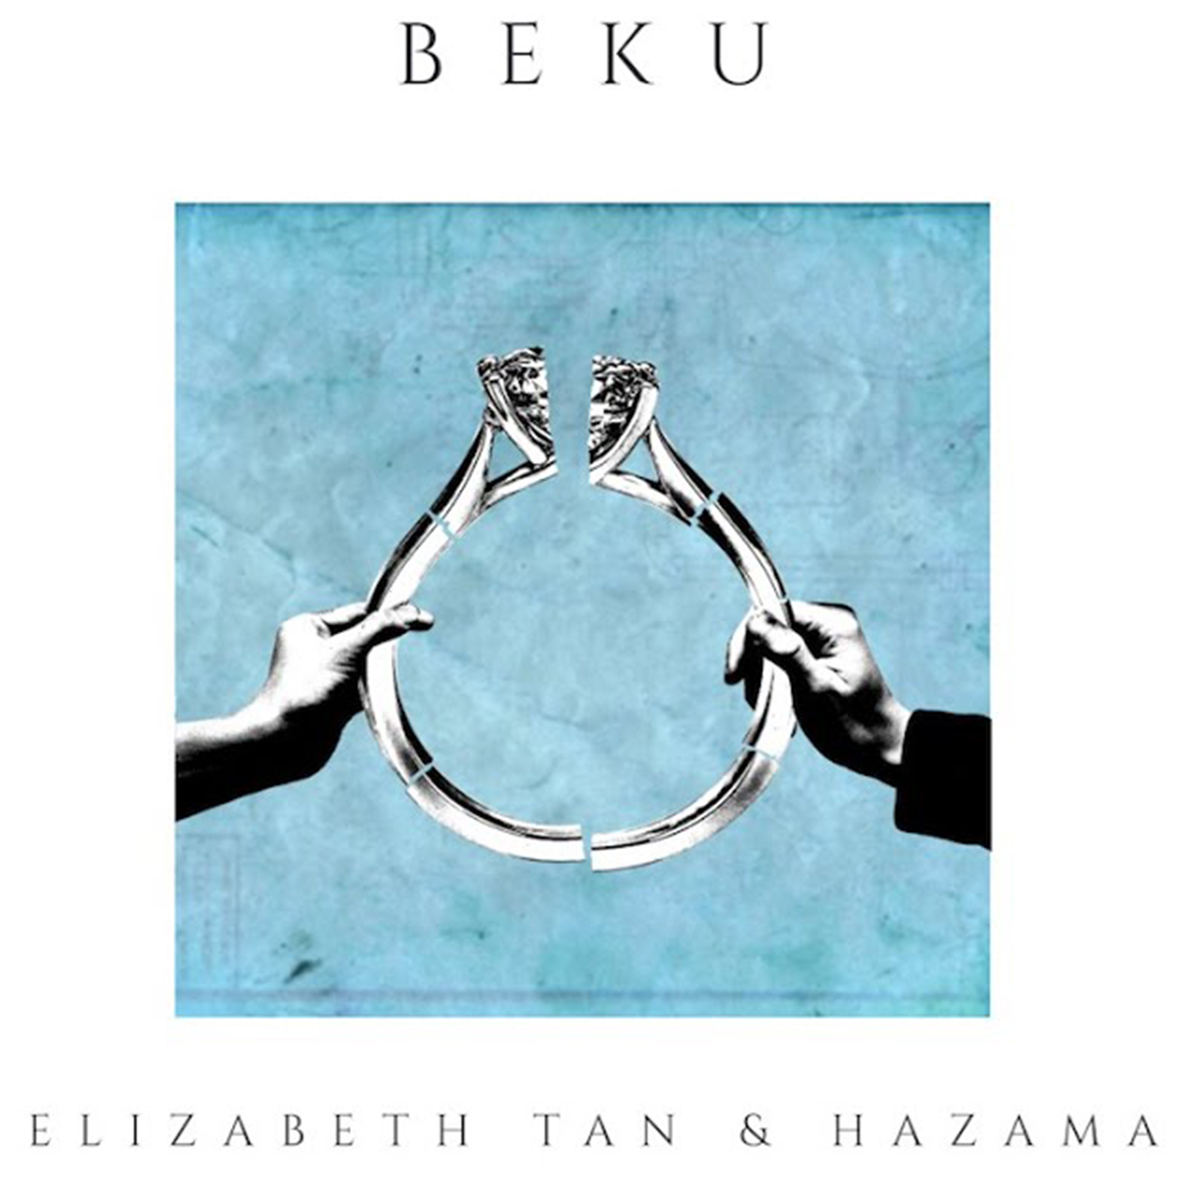 Beku Elizabeth Tan & Hazama